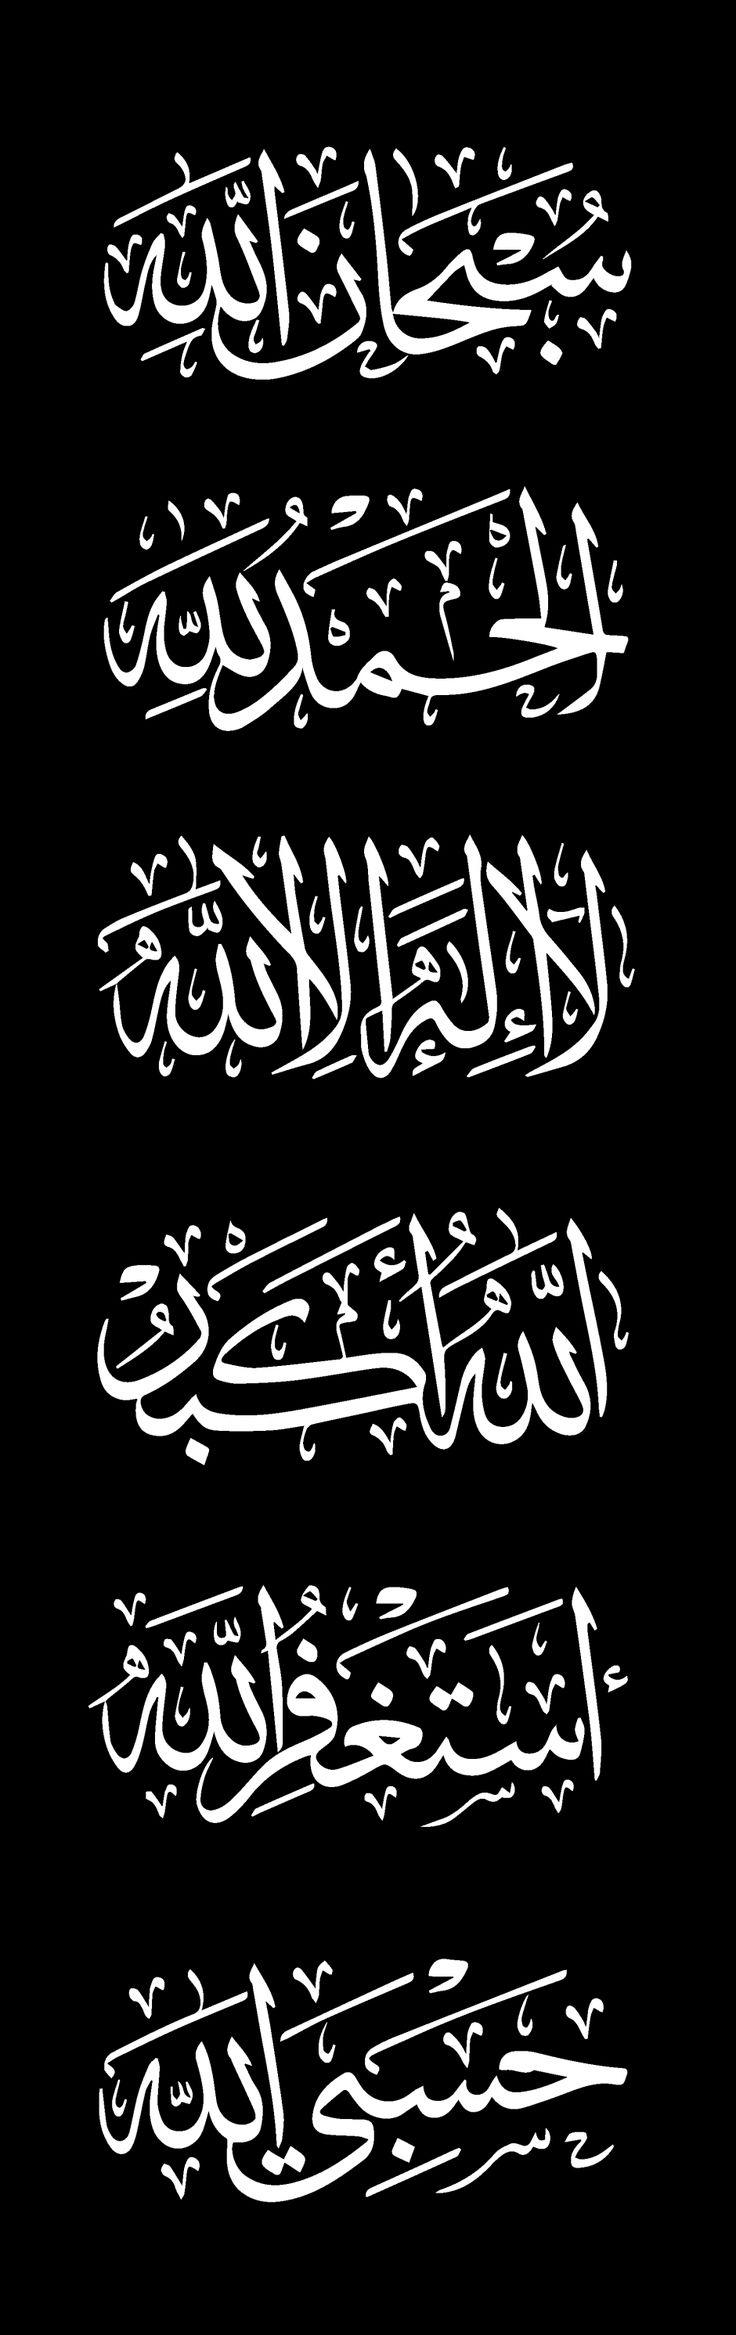 Tasbeeh. Subhan Allah, Alhamdulilah, La illaha Illa Allah, Allahu Akbar, Astagfur Allah, Hasbeya Allah